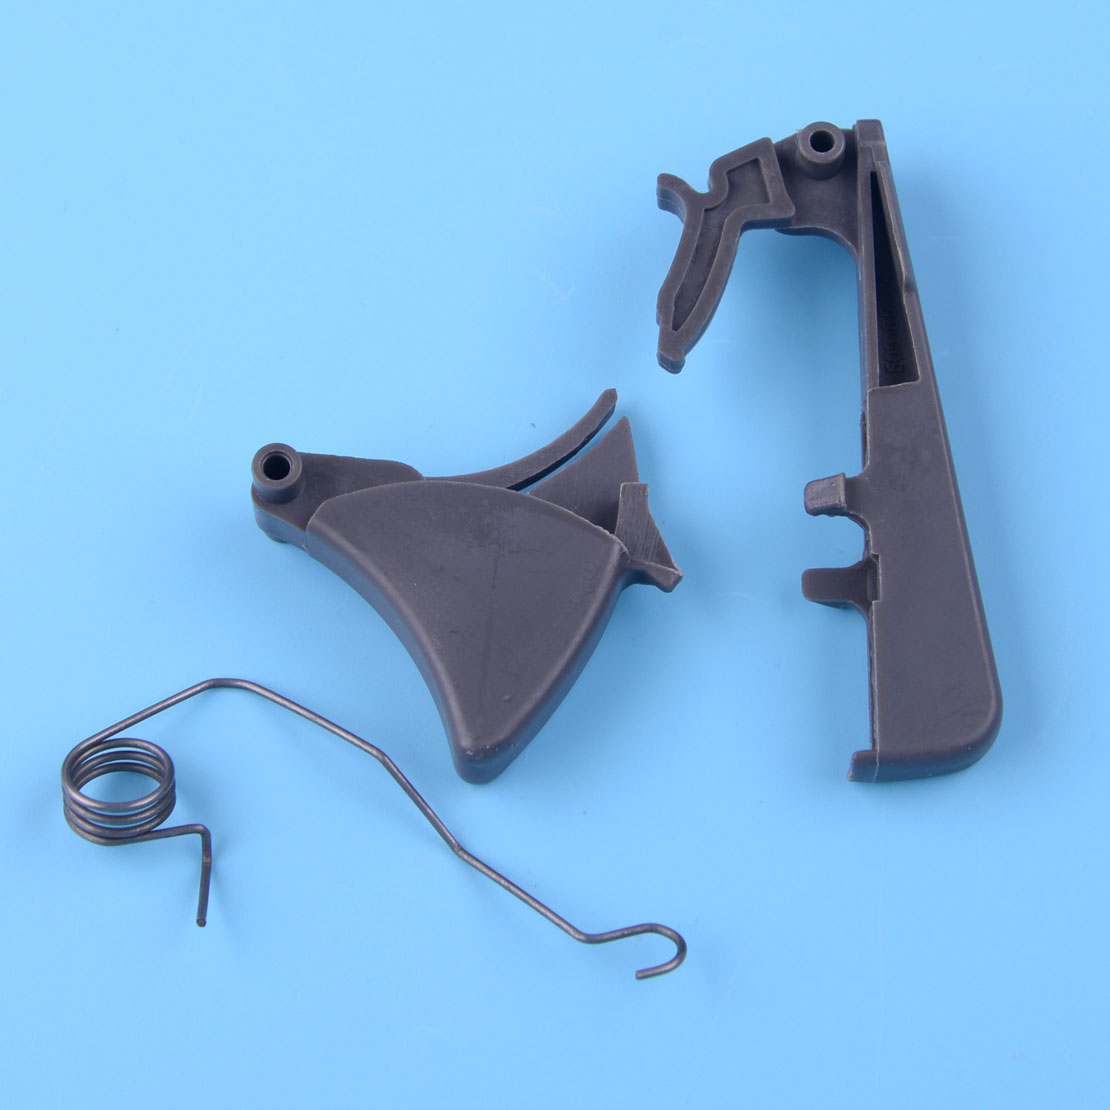 LETAOSK 3pcs/kit Throttle Trigger Arm Lock Spring Kit 503854401 503854501 Fit For Husqvarna 357 359 346XP 340 345 350 Spare Part